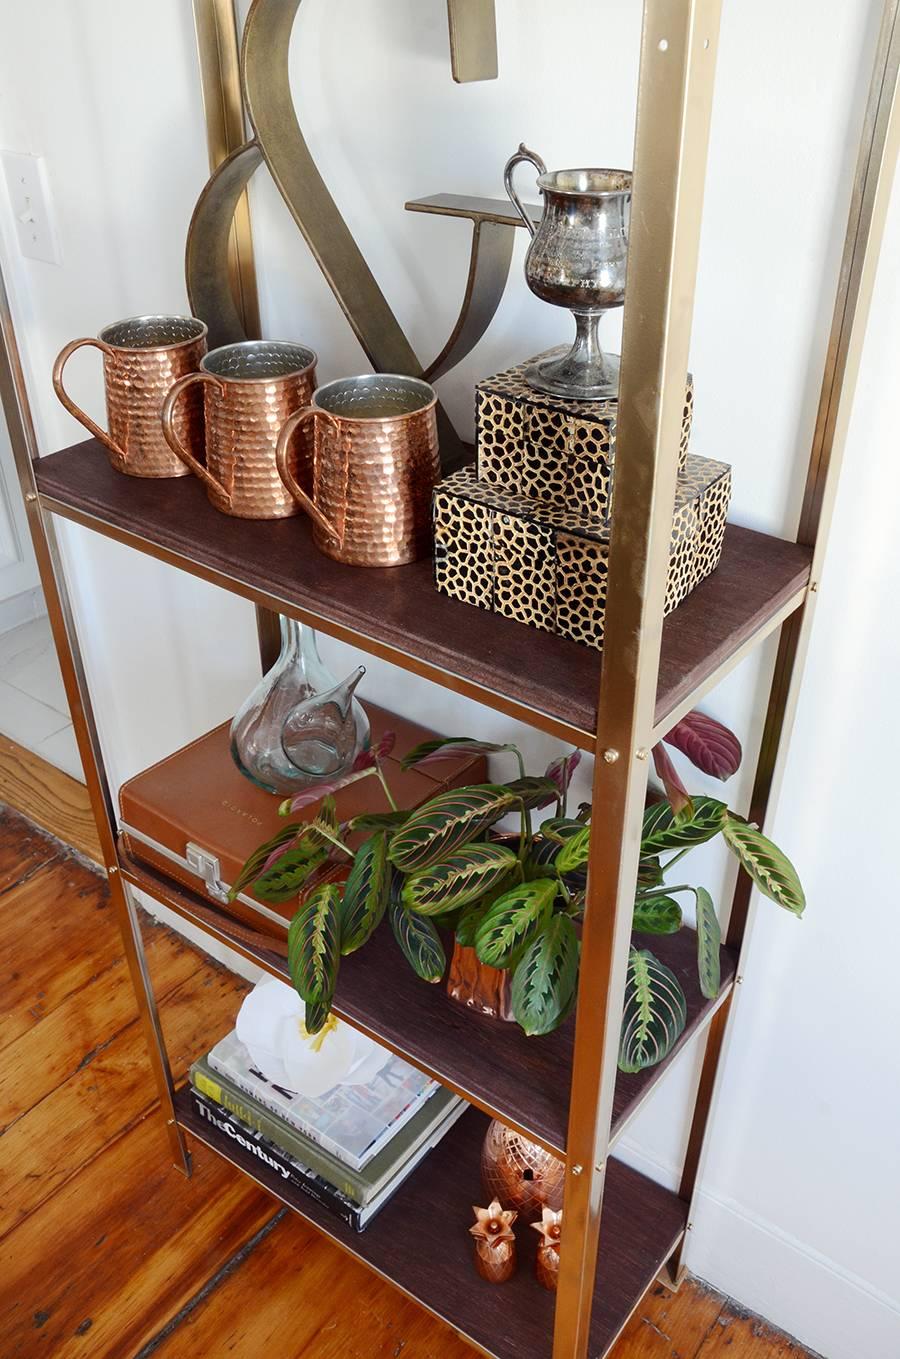 IKEA Hack: A Utilitarian Shelf Goes Rustic Glam